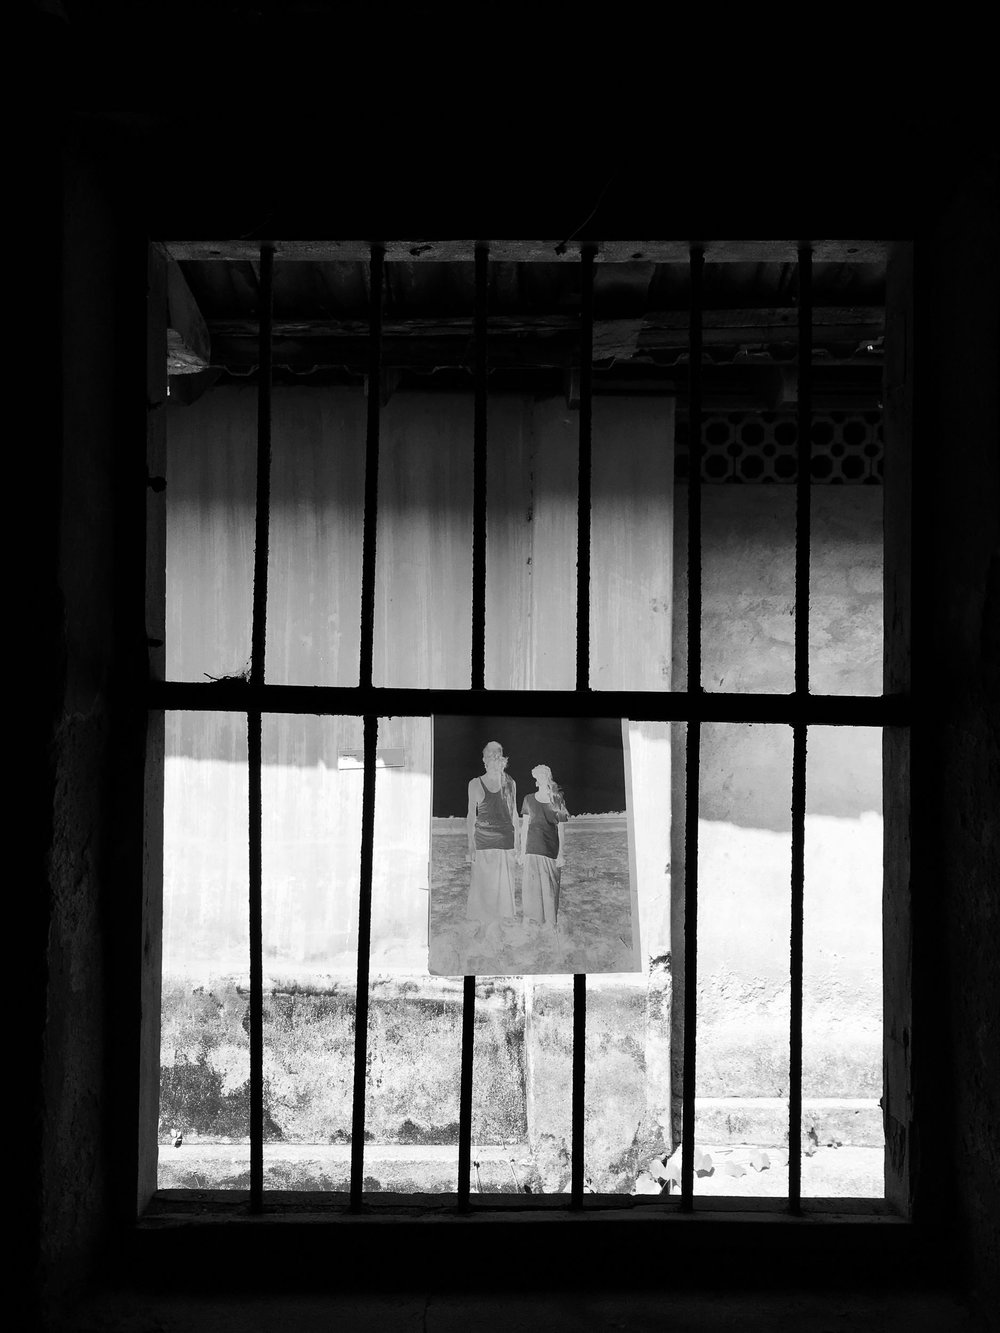 Sindhur_Photography_Kochi Muziris Biennale -2019-60.JPG